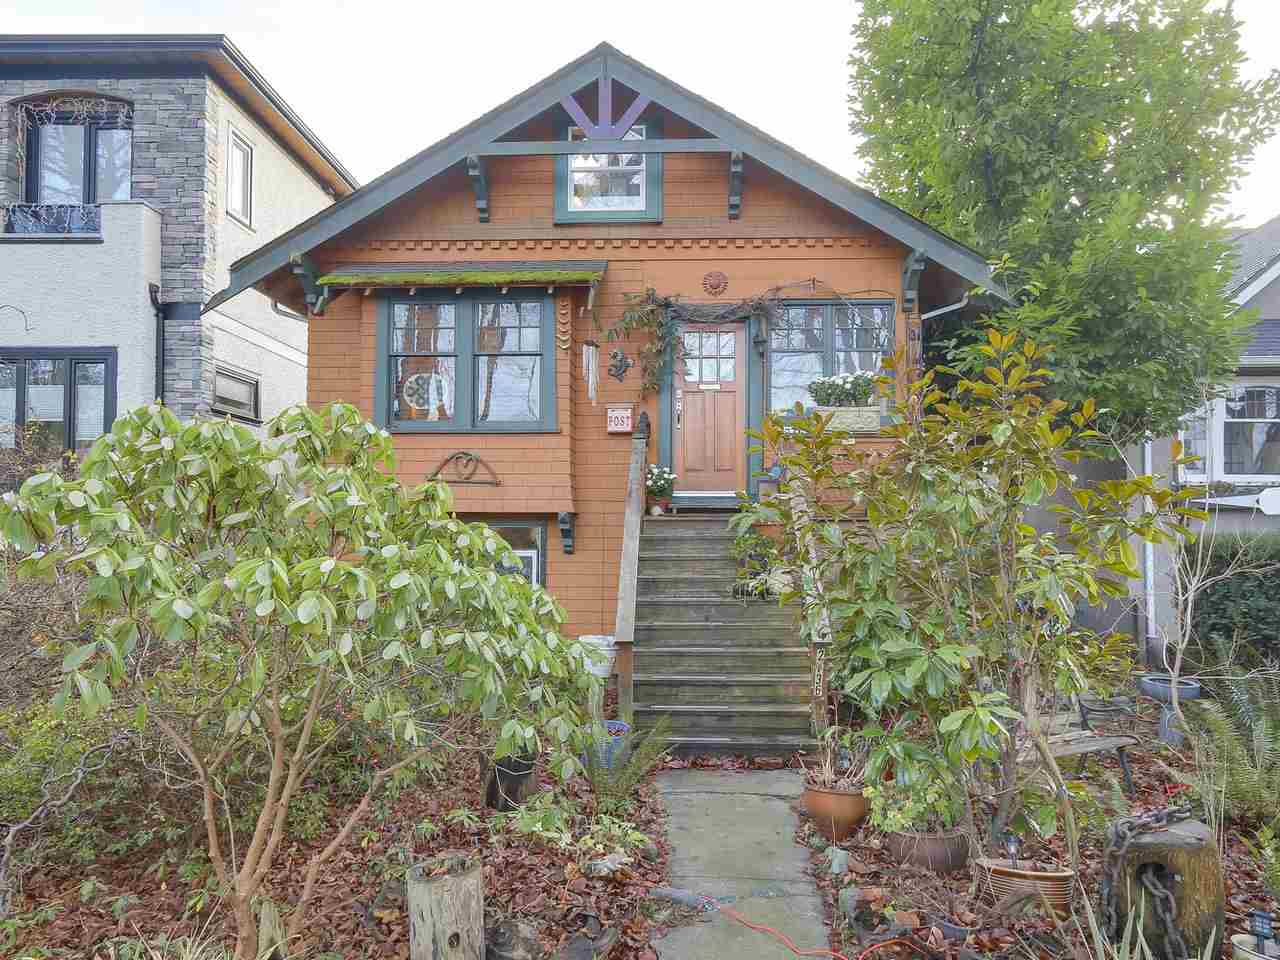 2736 W 13TH AVENUE, Vancouver, BC, V6K 2T4 Primary Photo